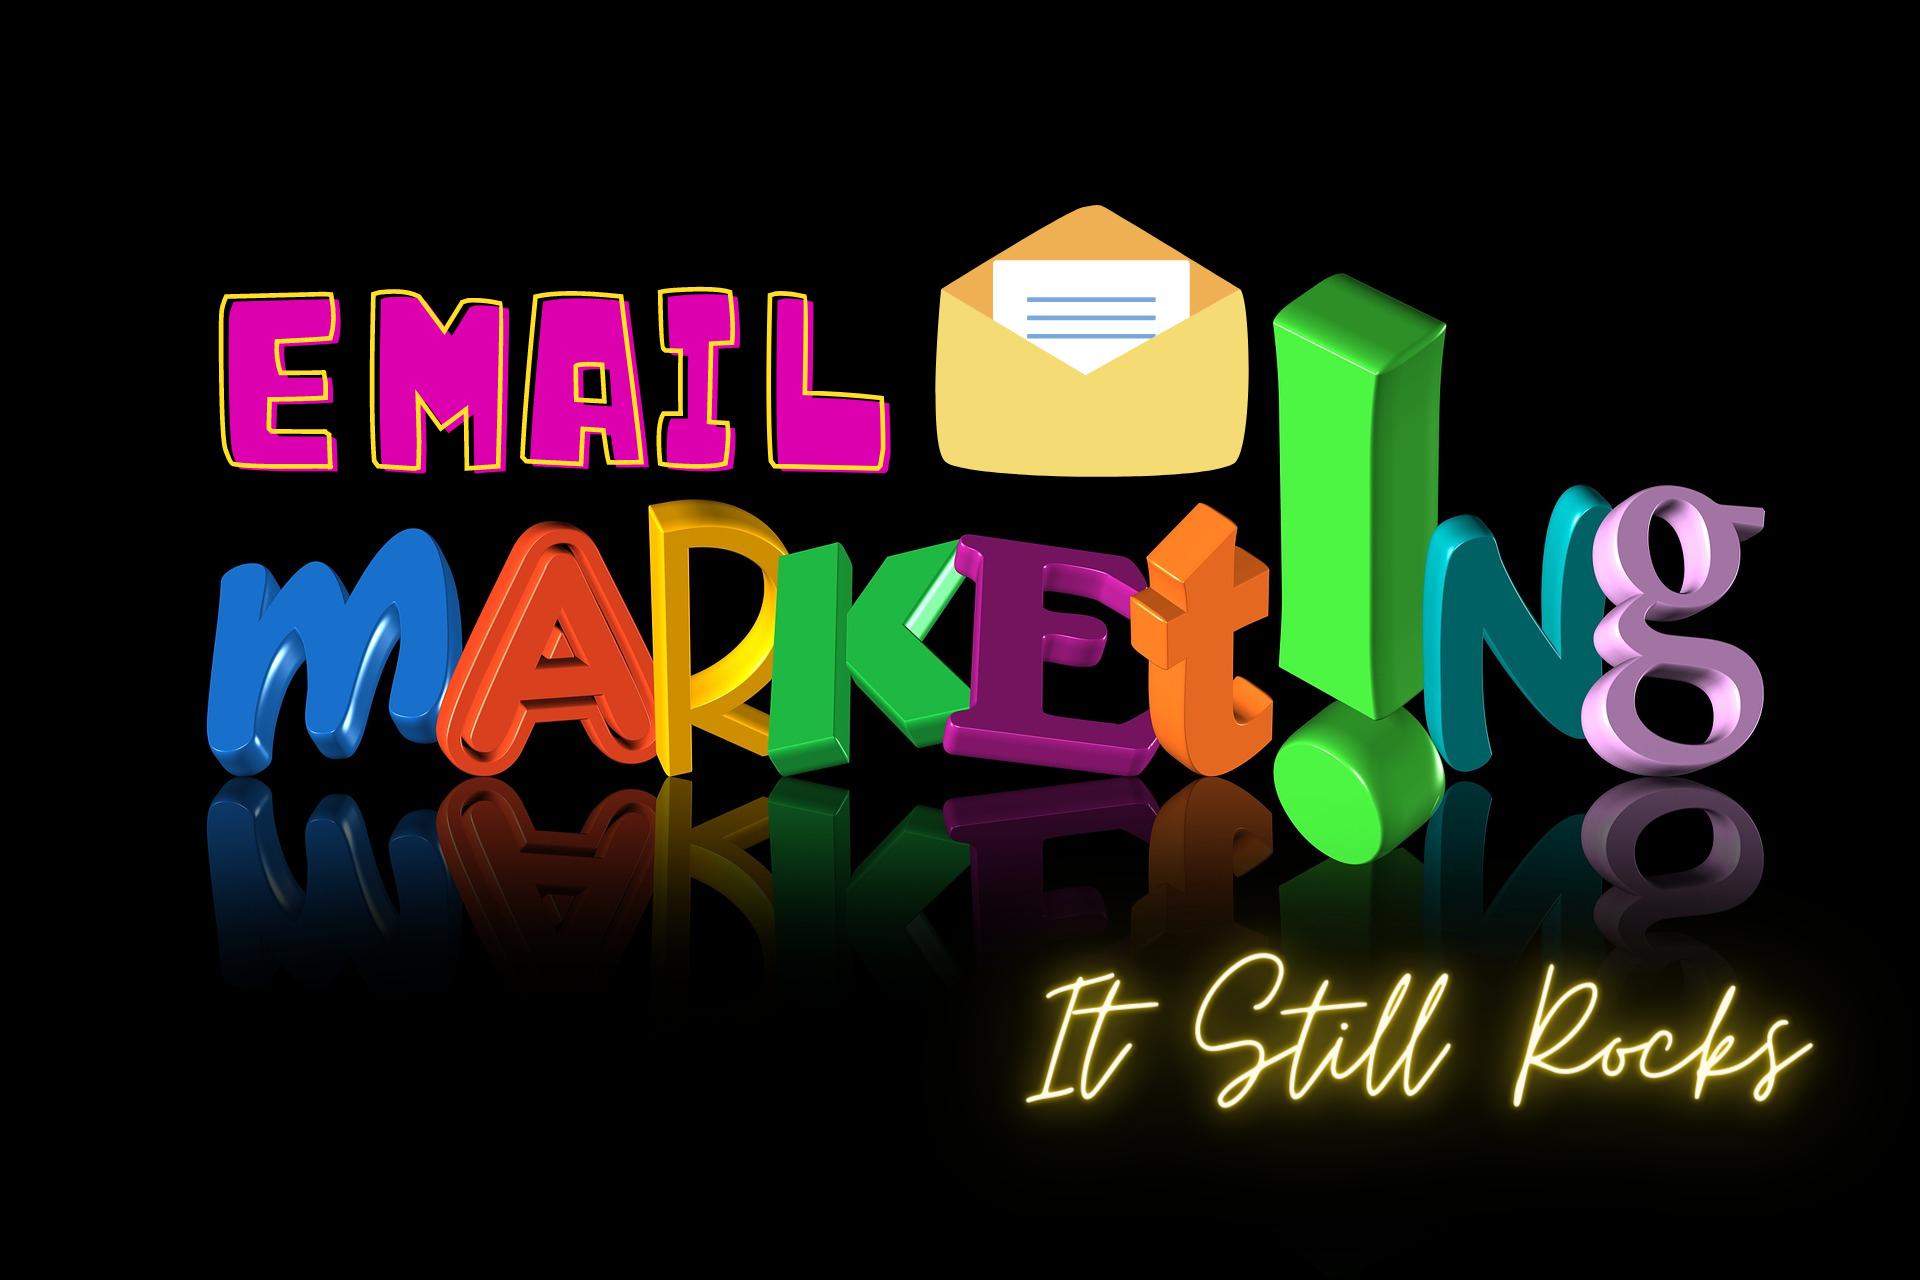 Email Marketing, Email Marketing Tools, Email marketing service, Email marketing Strategies